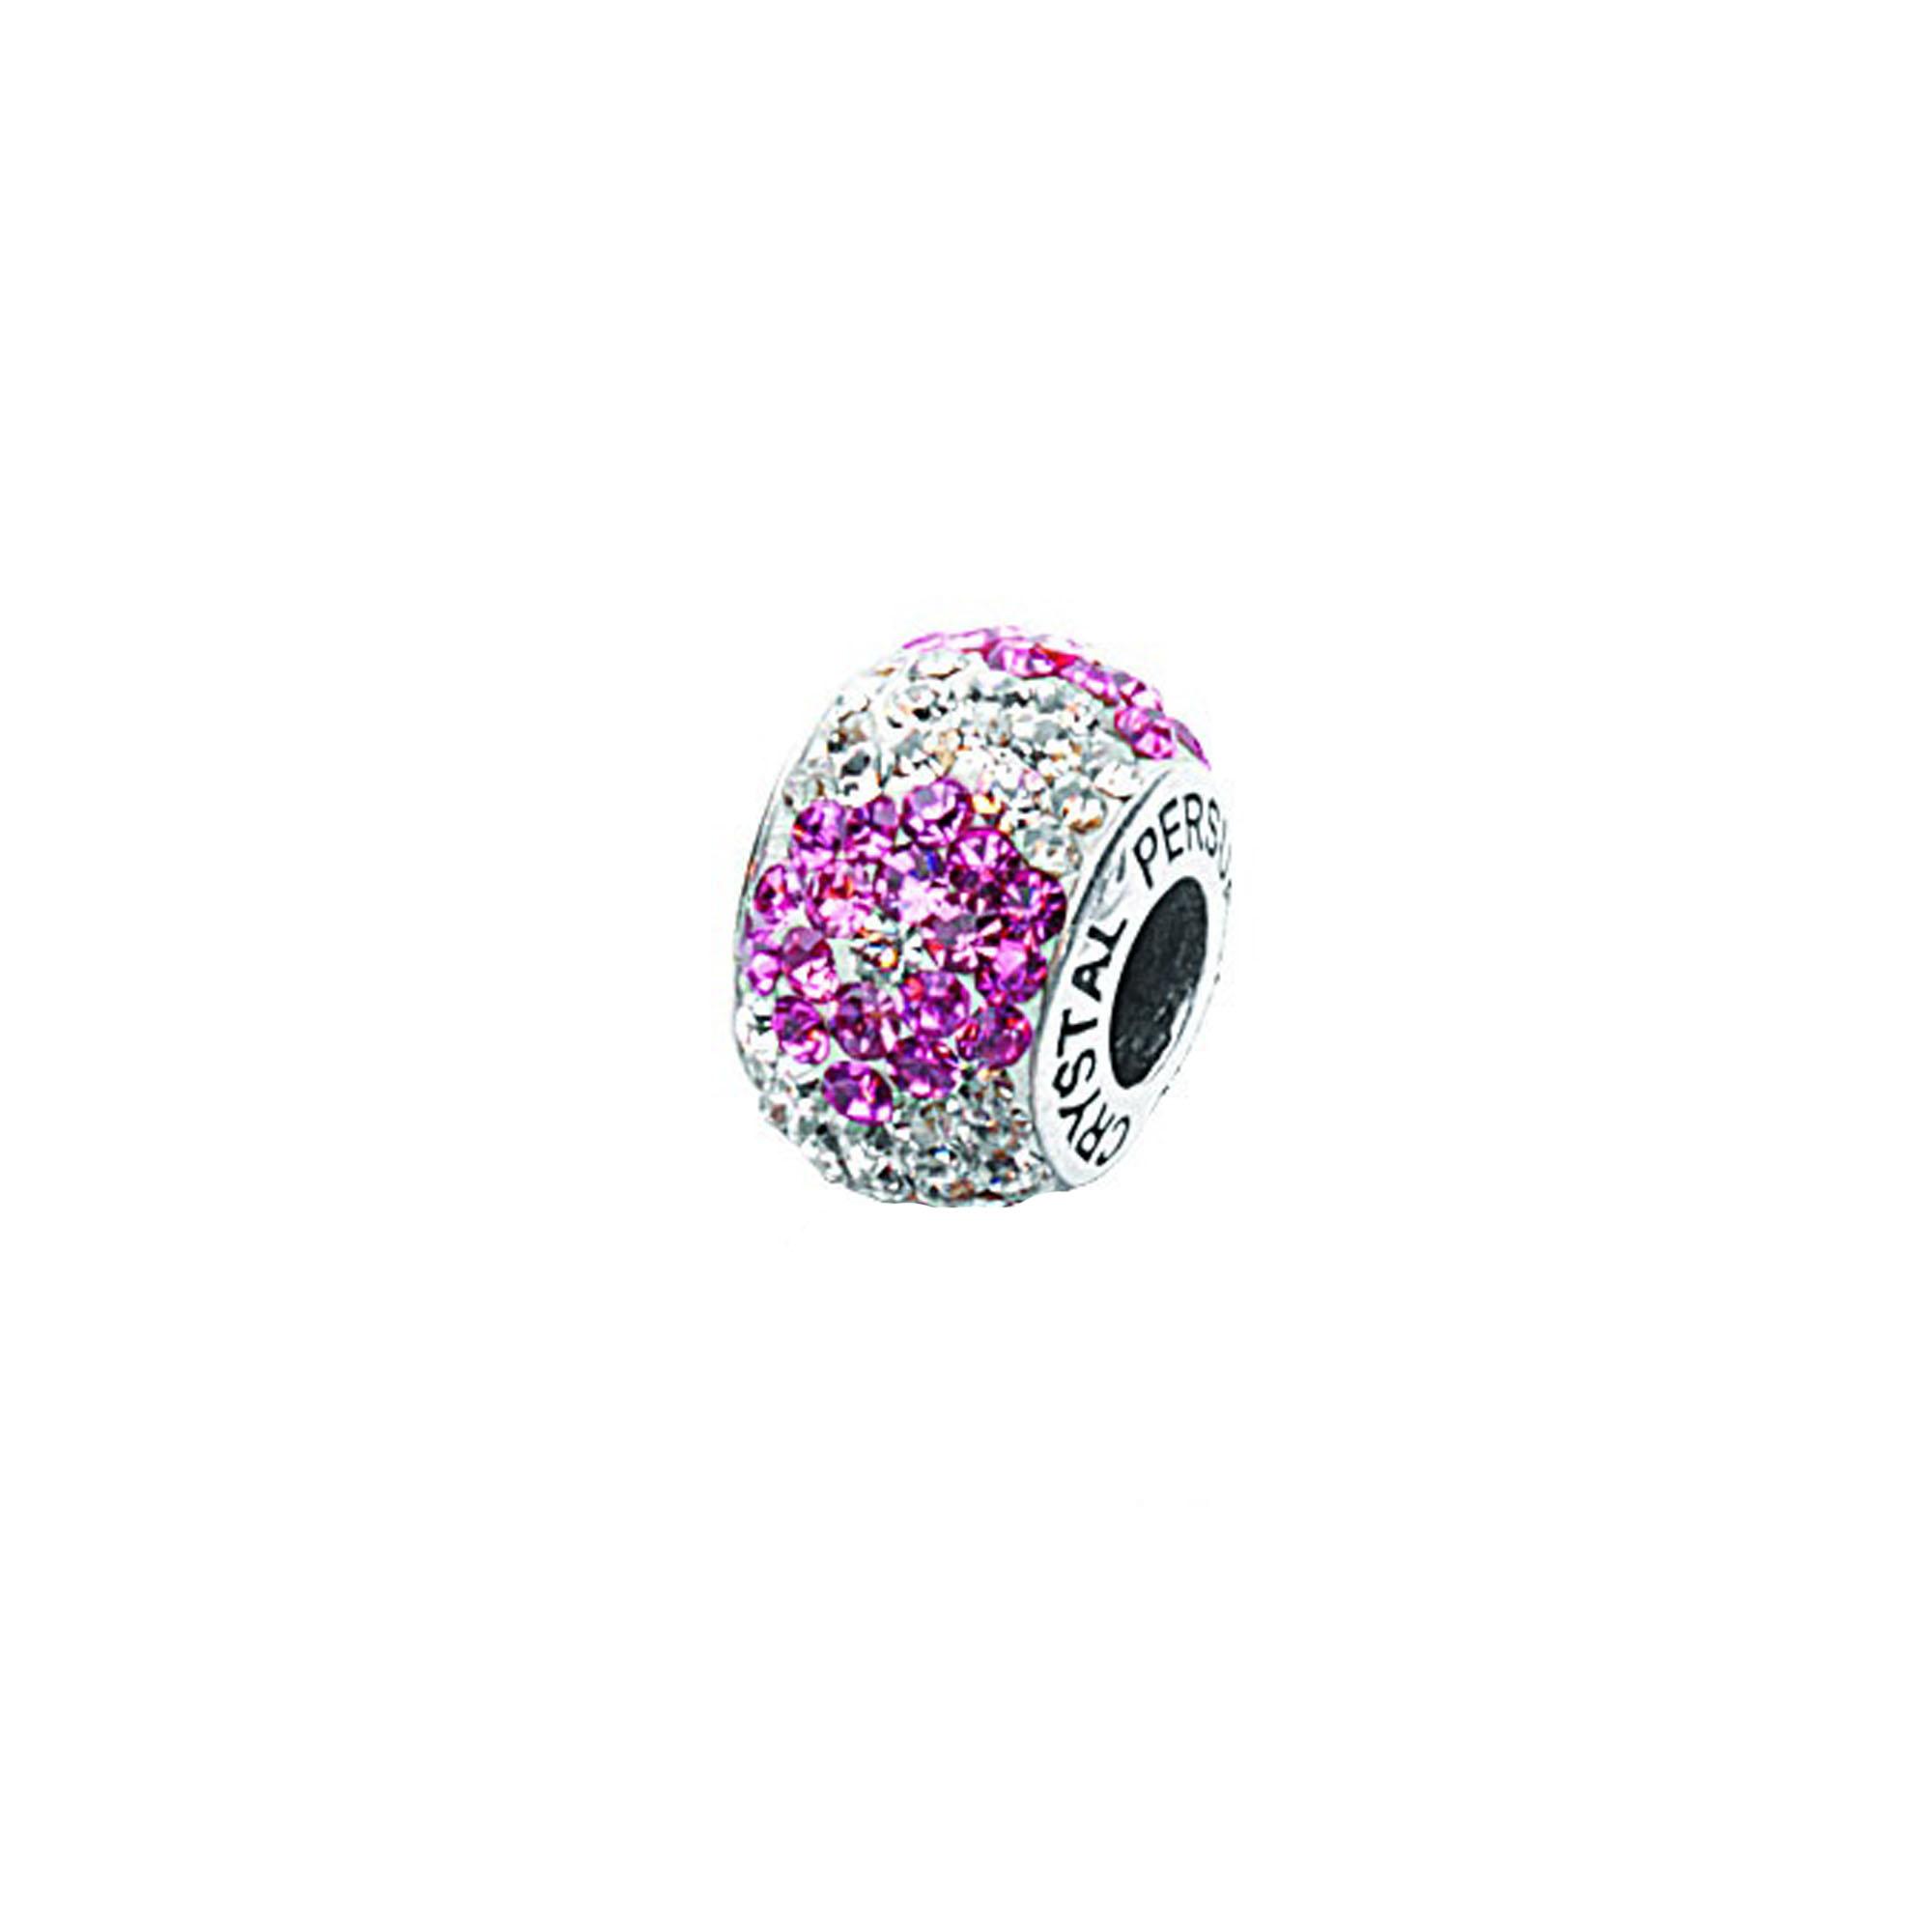 Silver Pendant, Flower Pink/ White Cyrstal Bead